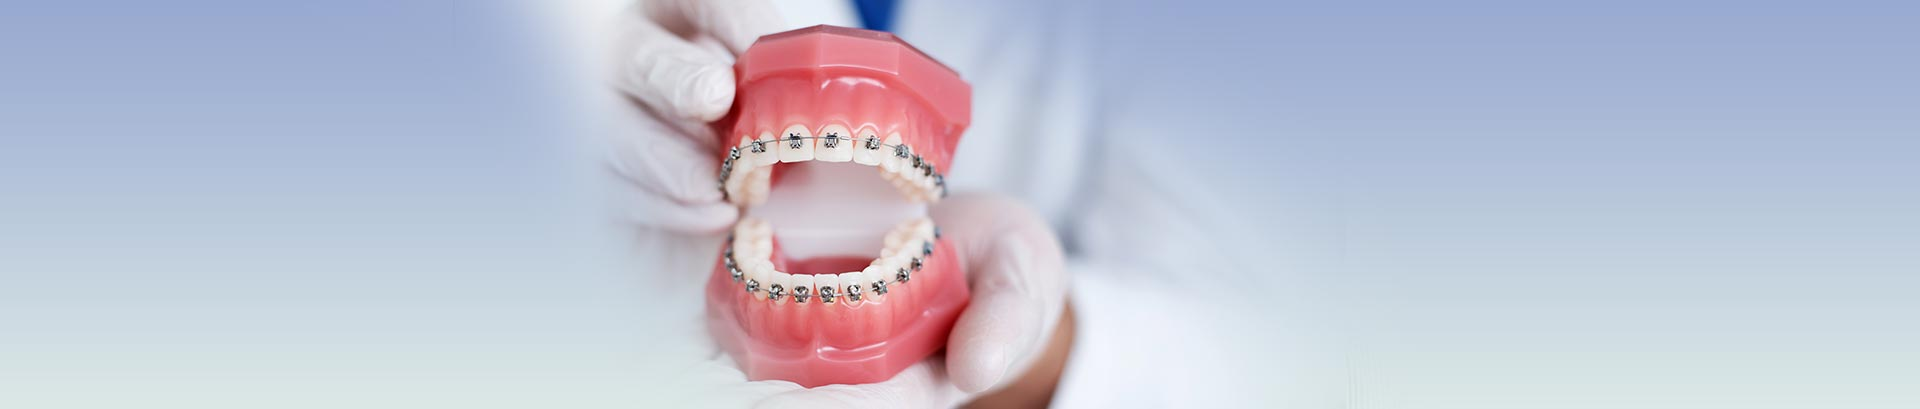 Metal self-ligating braces, London